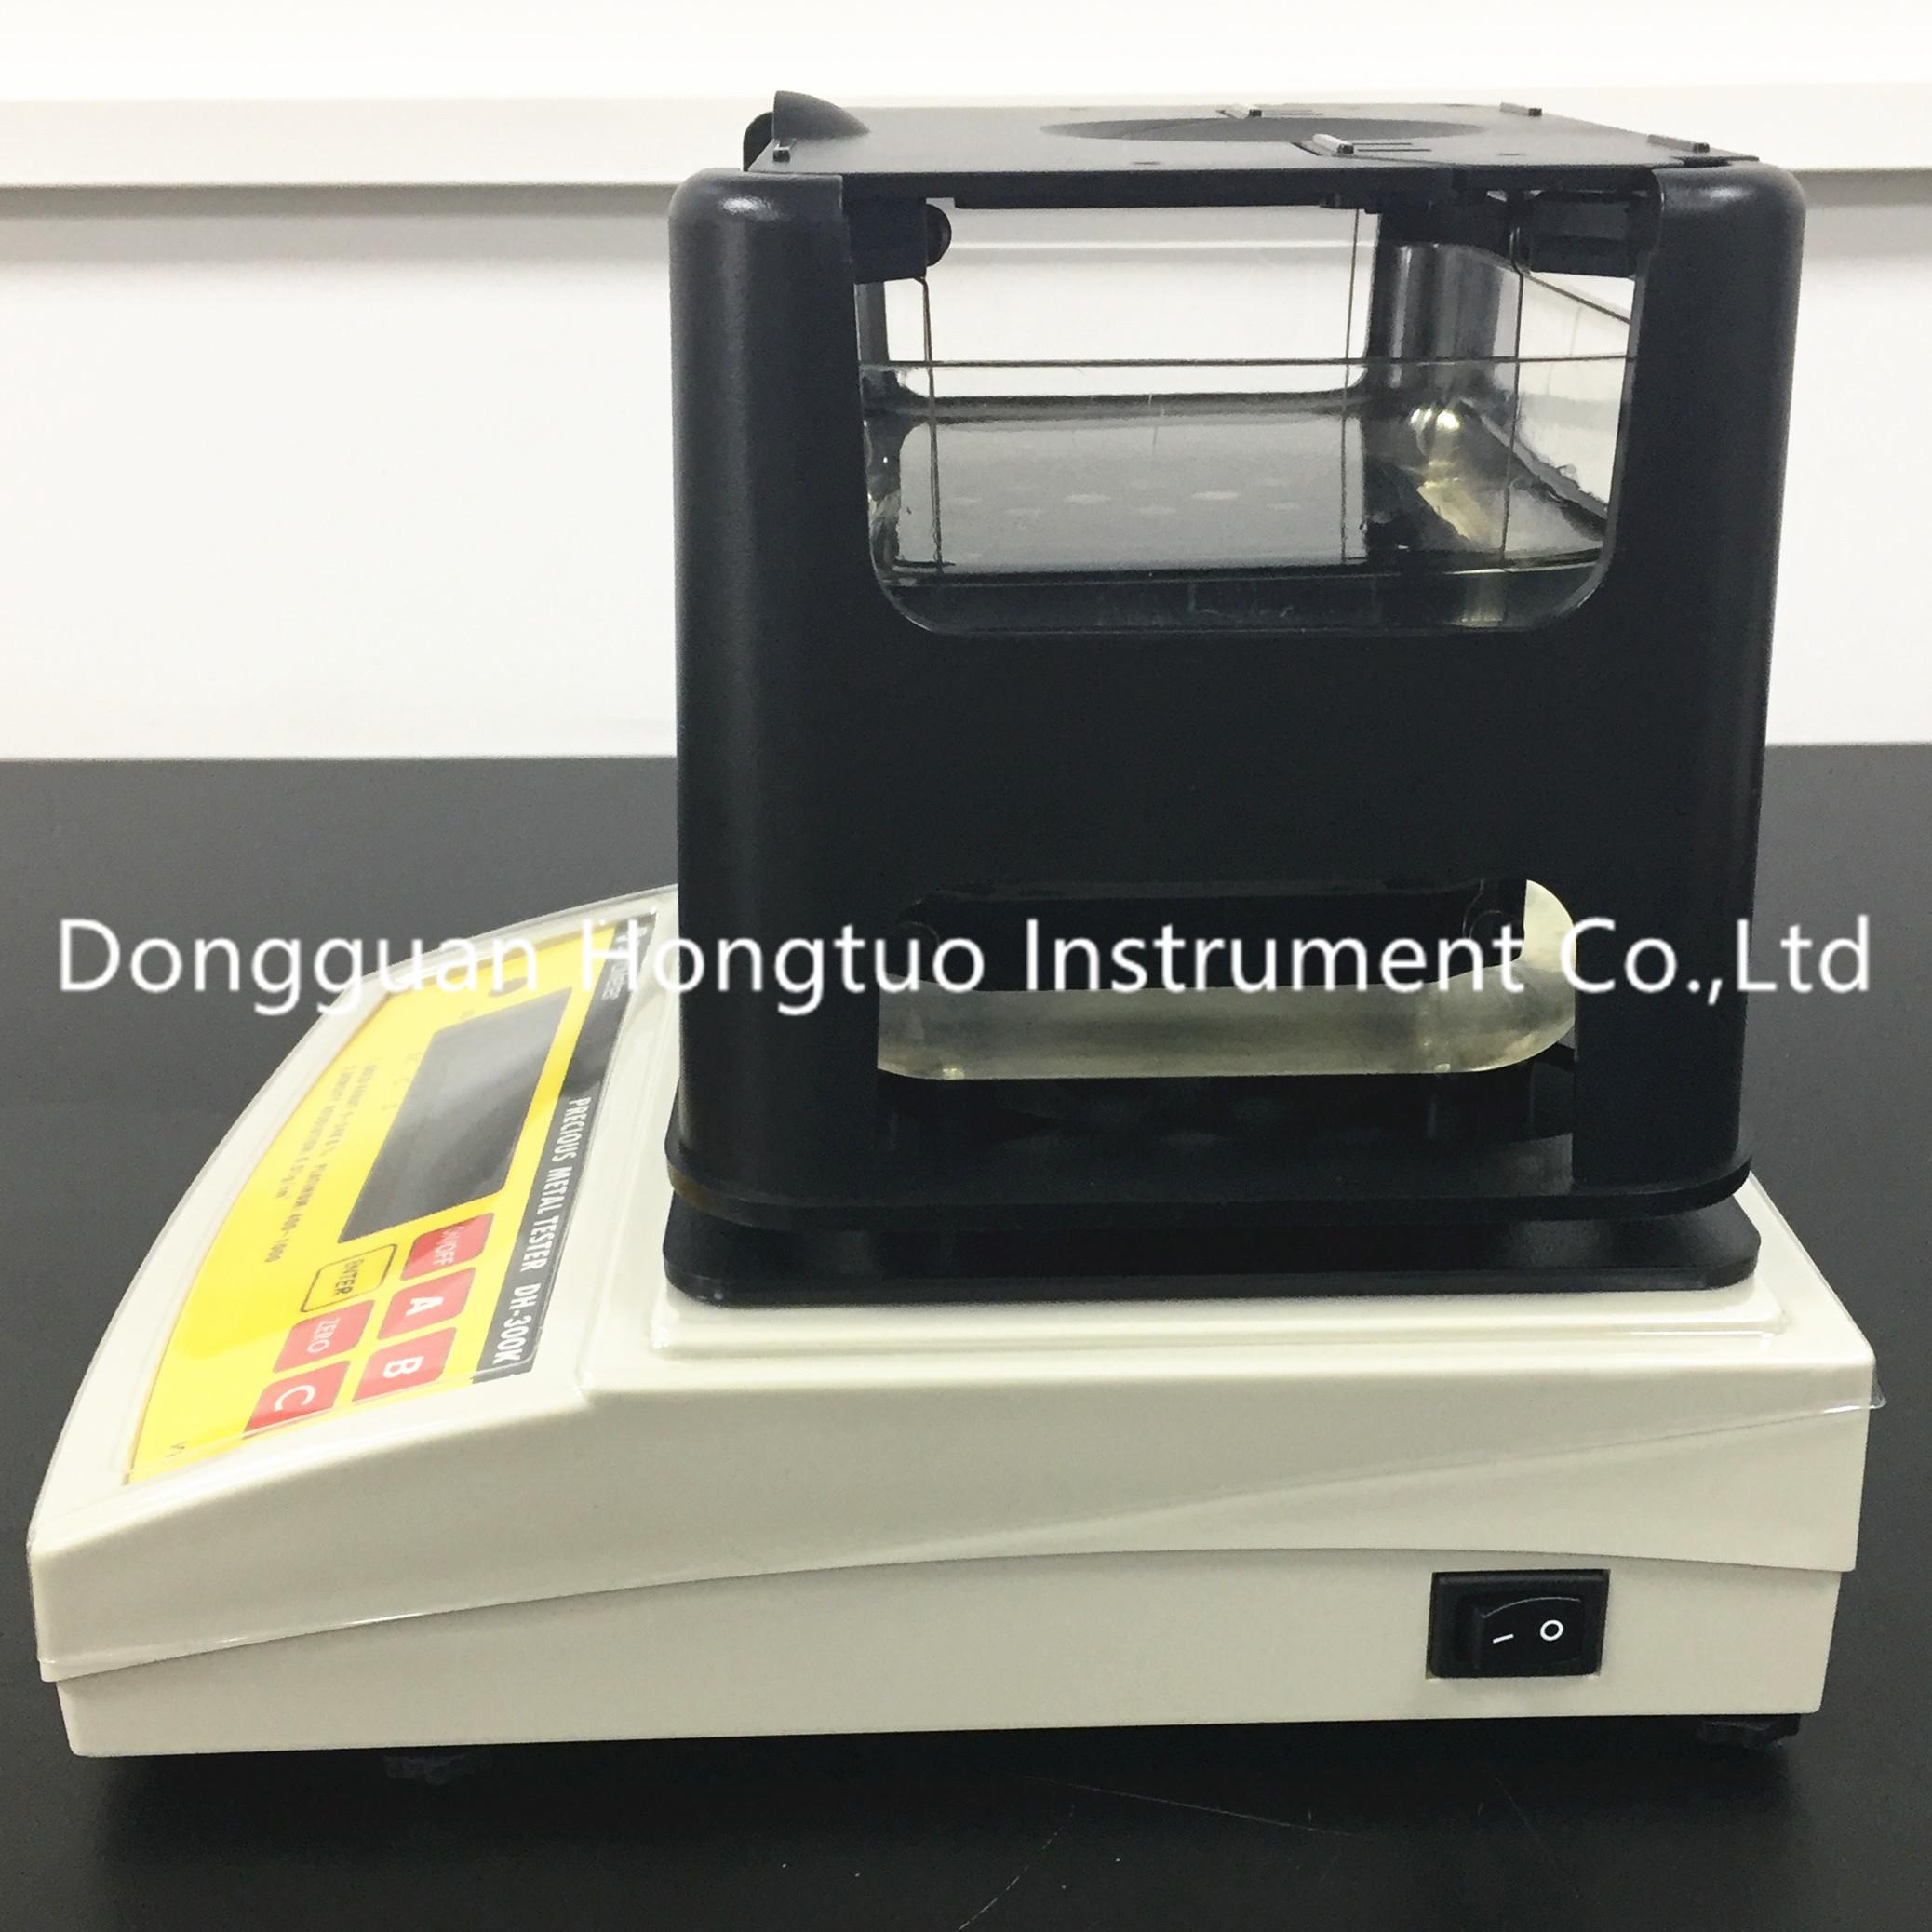 DH-3000K Digital Electronic Gold Analyzer